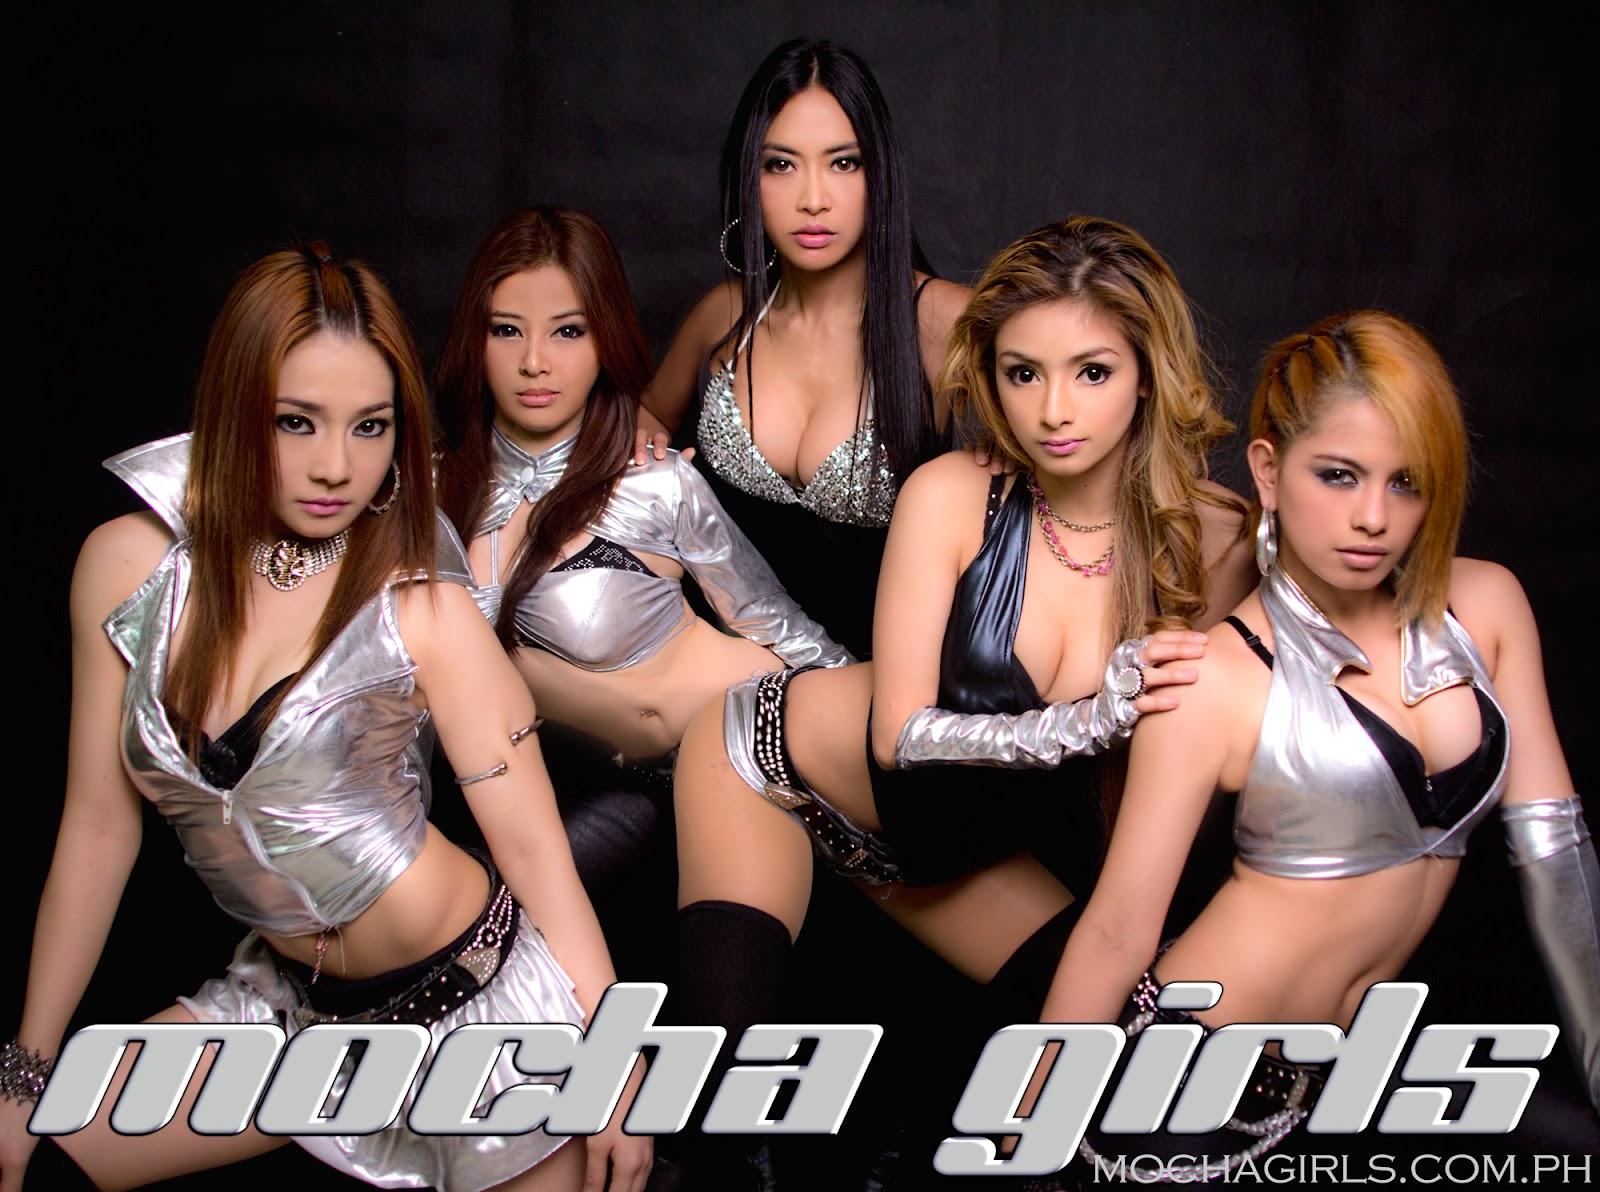 http://2.bp.blogspot.com/-H8heaQw5Ves/UFIMvpTkpiI/AAAAAAAAPSw/_gRXs3iXXvo/s1600/mocha-girls.jpg